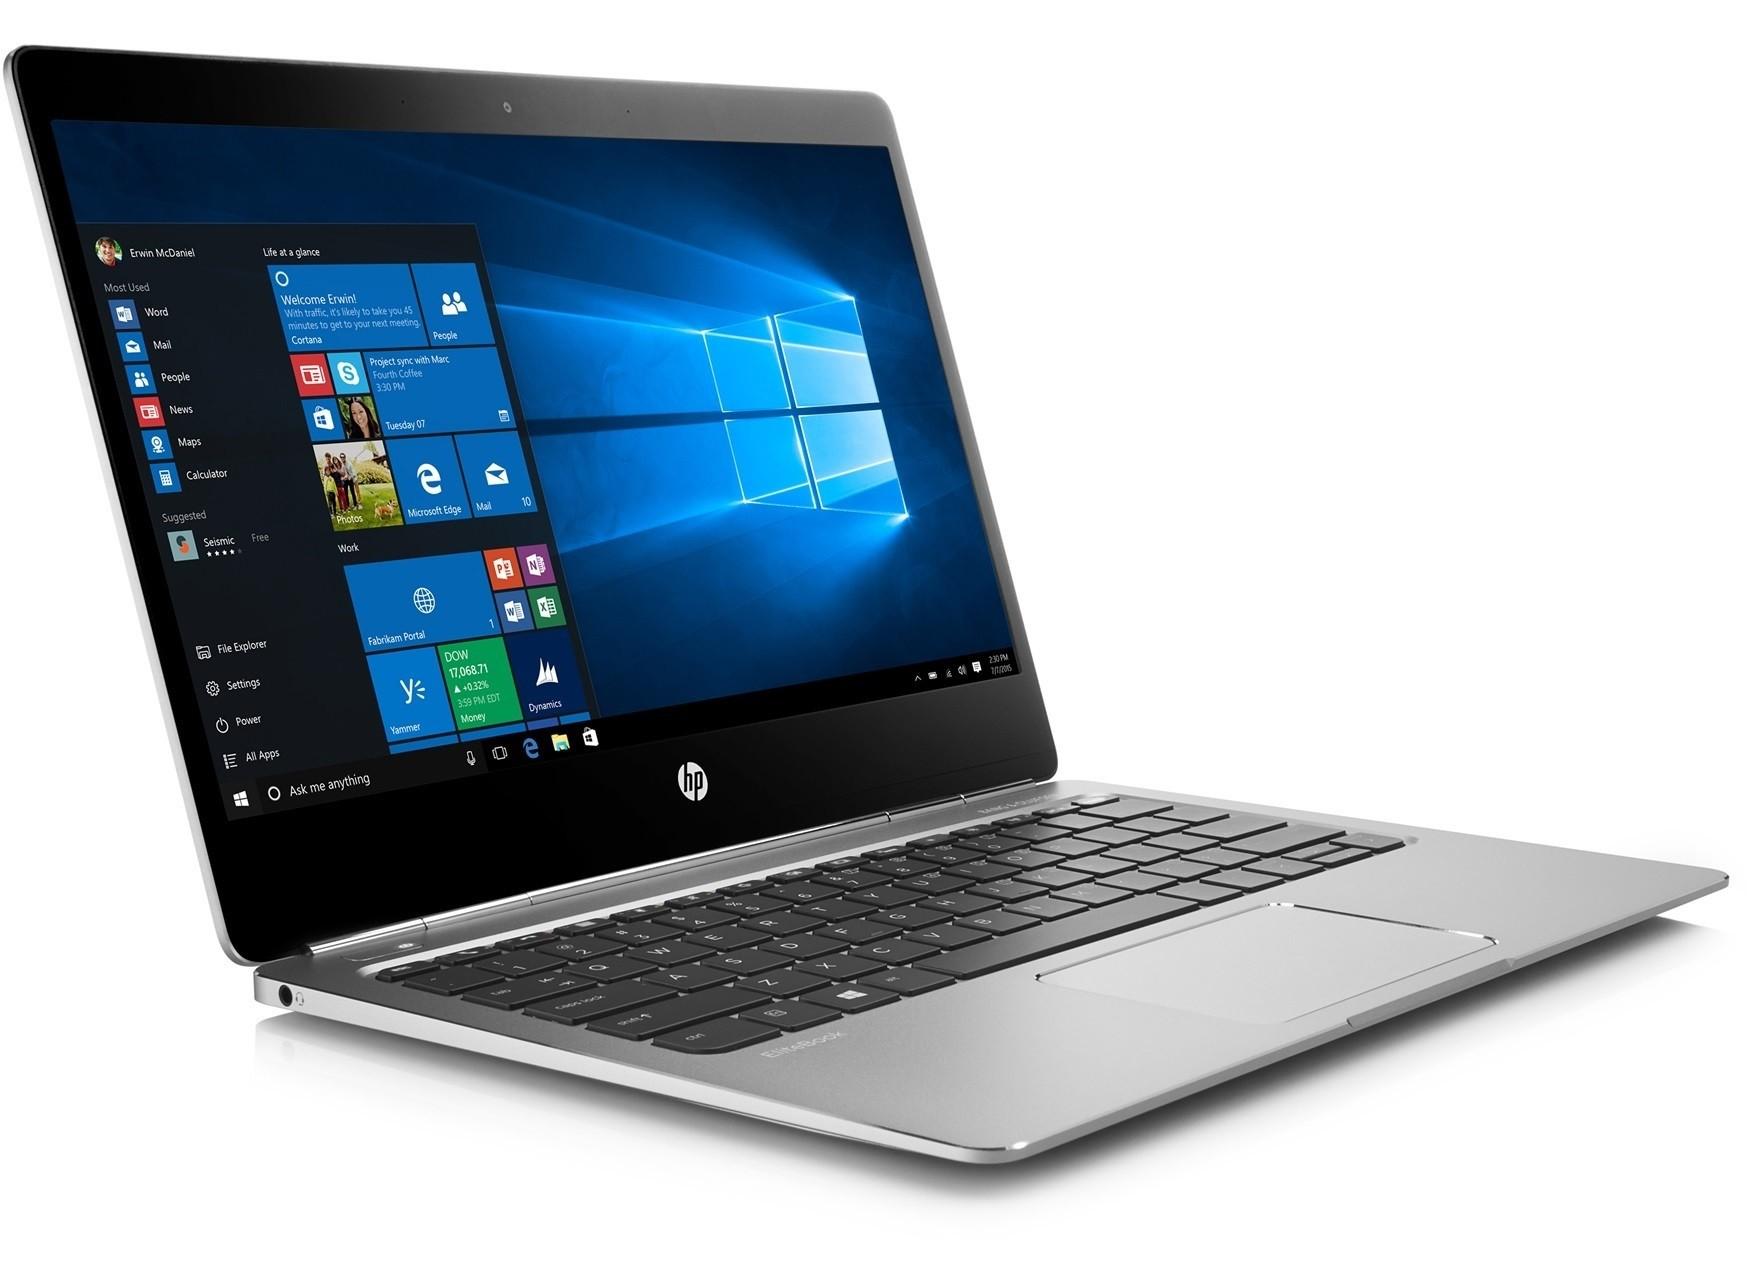 Ремонт ноутбуков HP в Воронеже